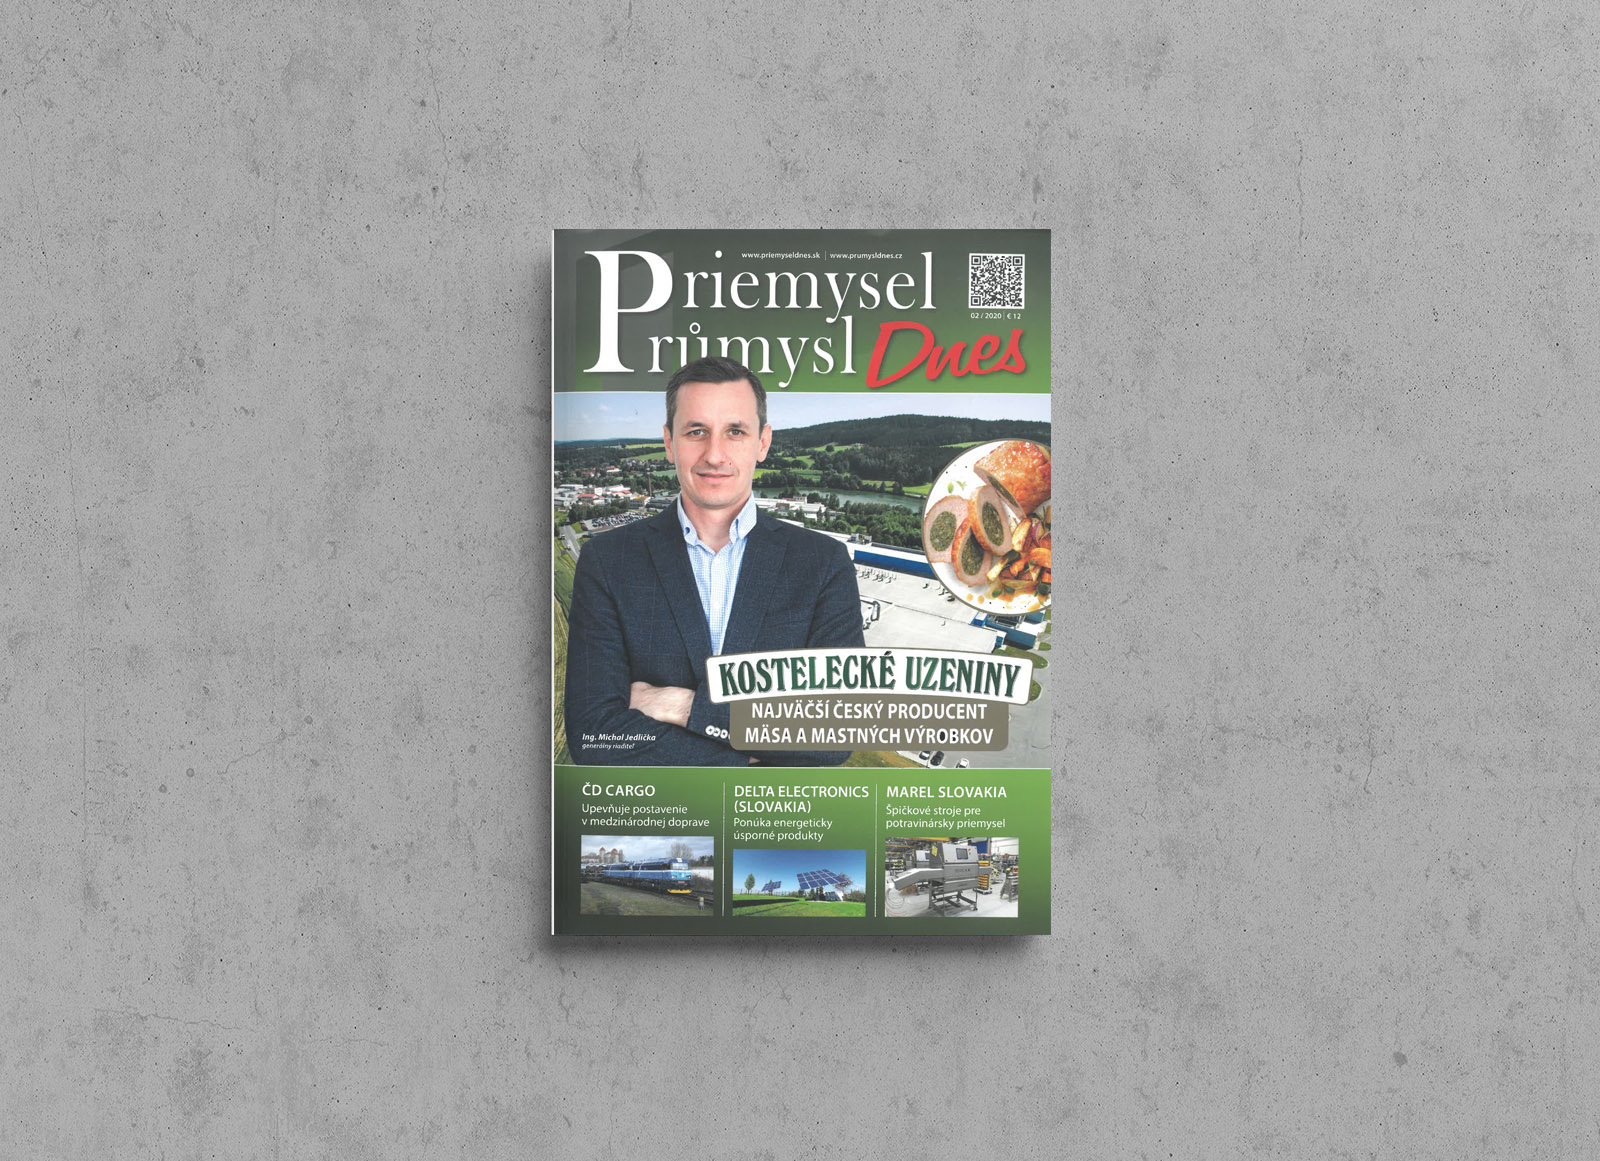 LIKO-S v časopise Priemysel Dnes